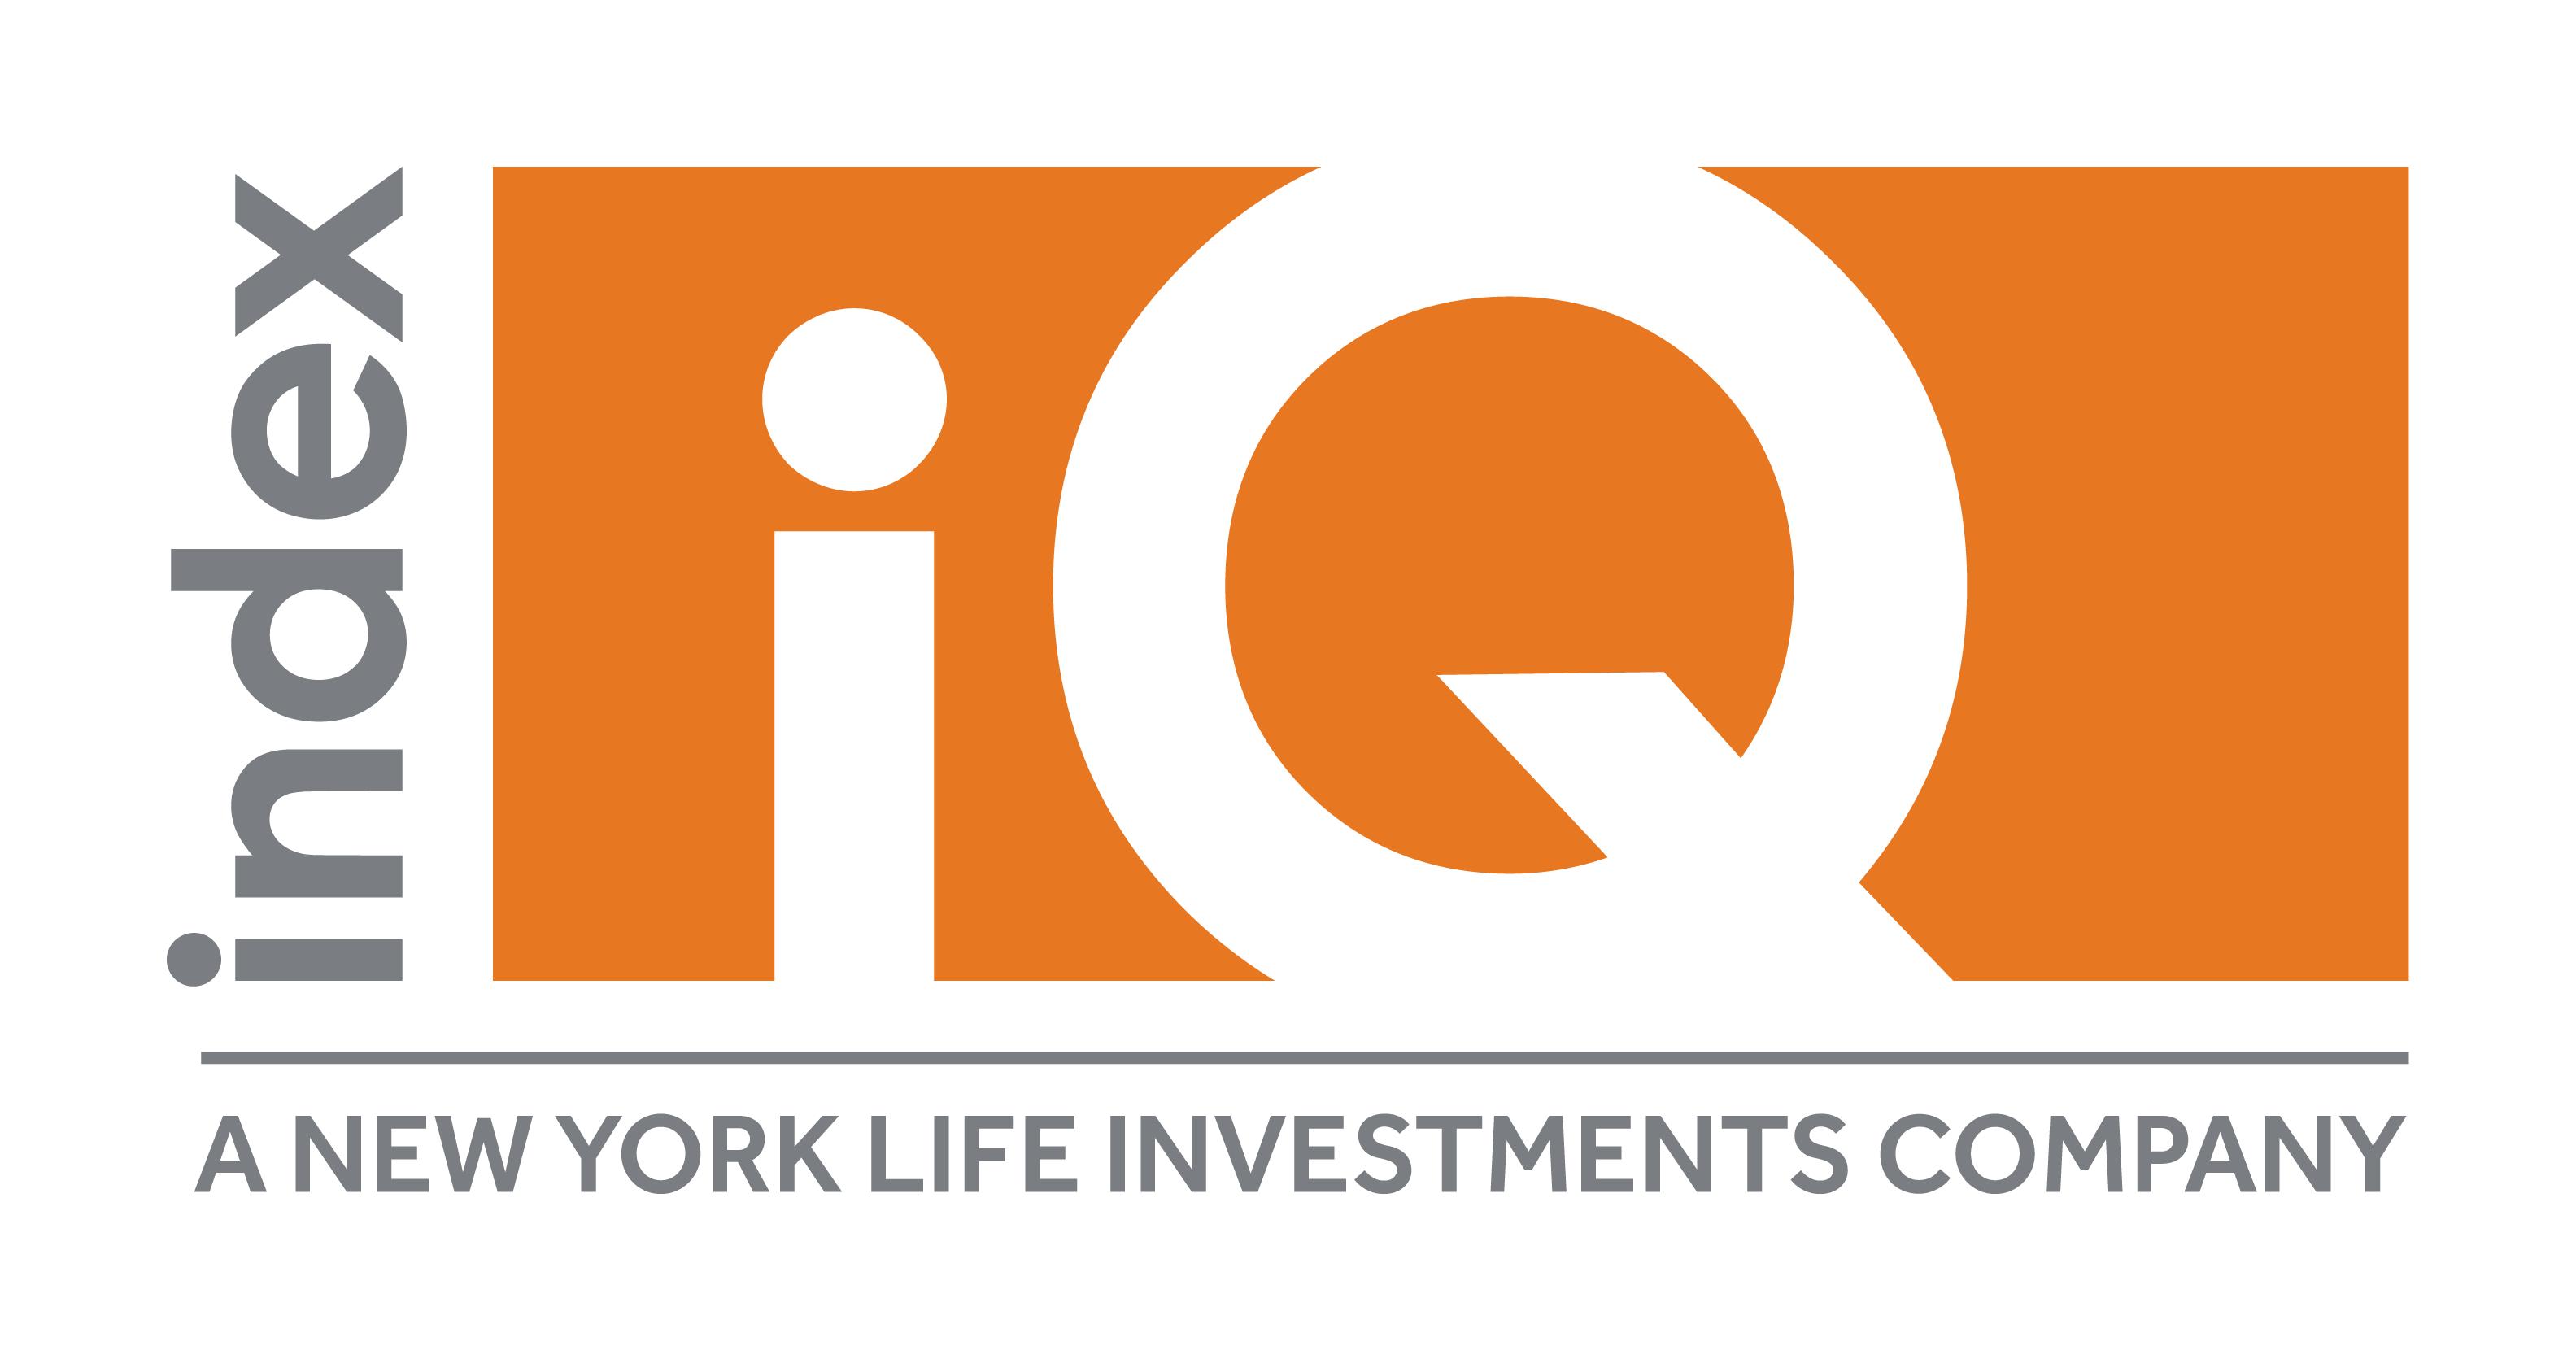 Index Iq Alps Pimco Etfs Global X Oppenheimer Funds